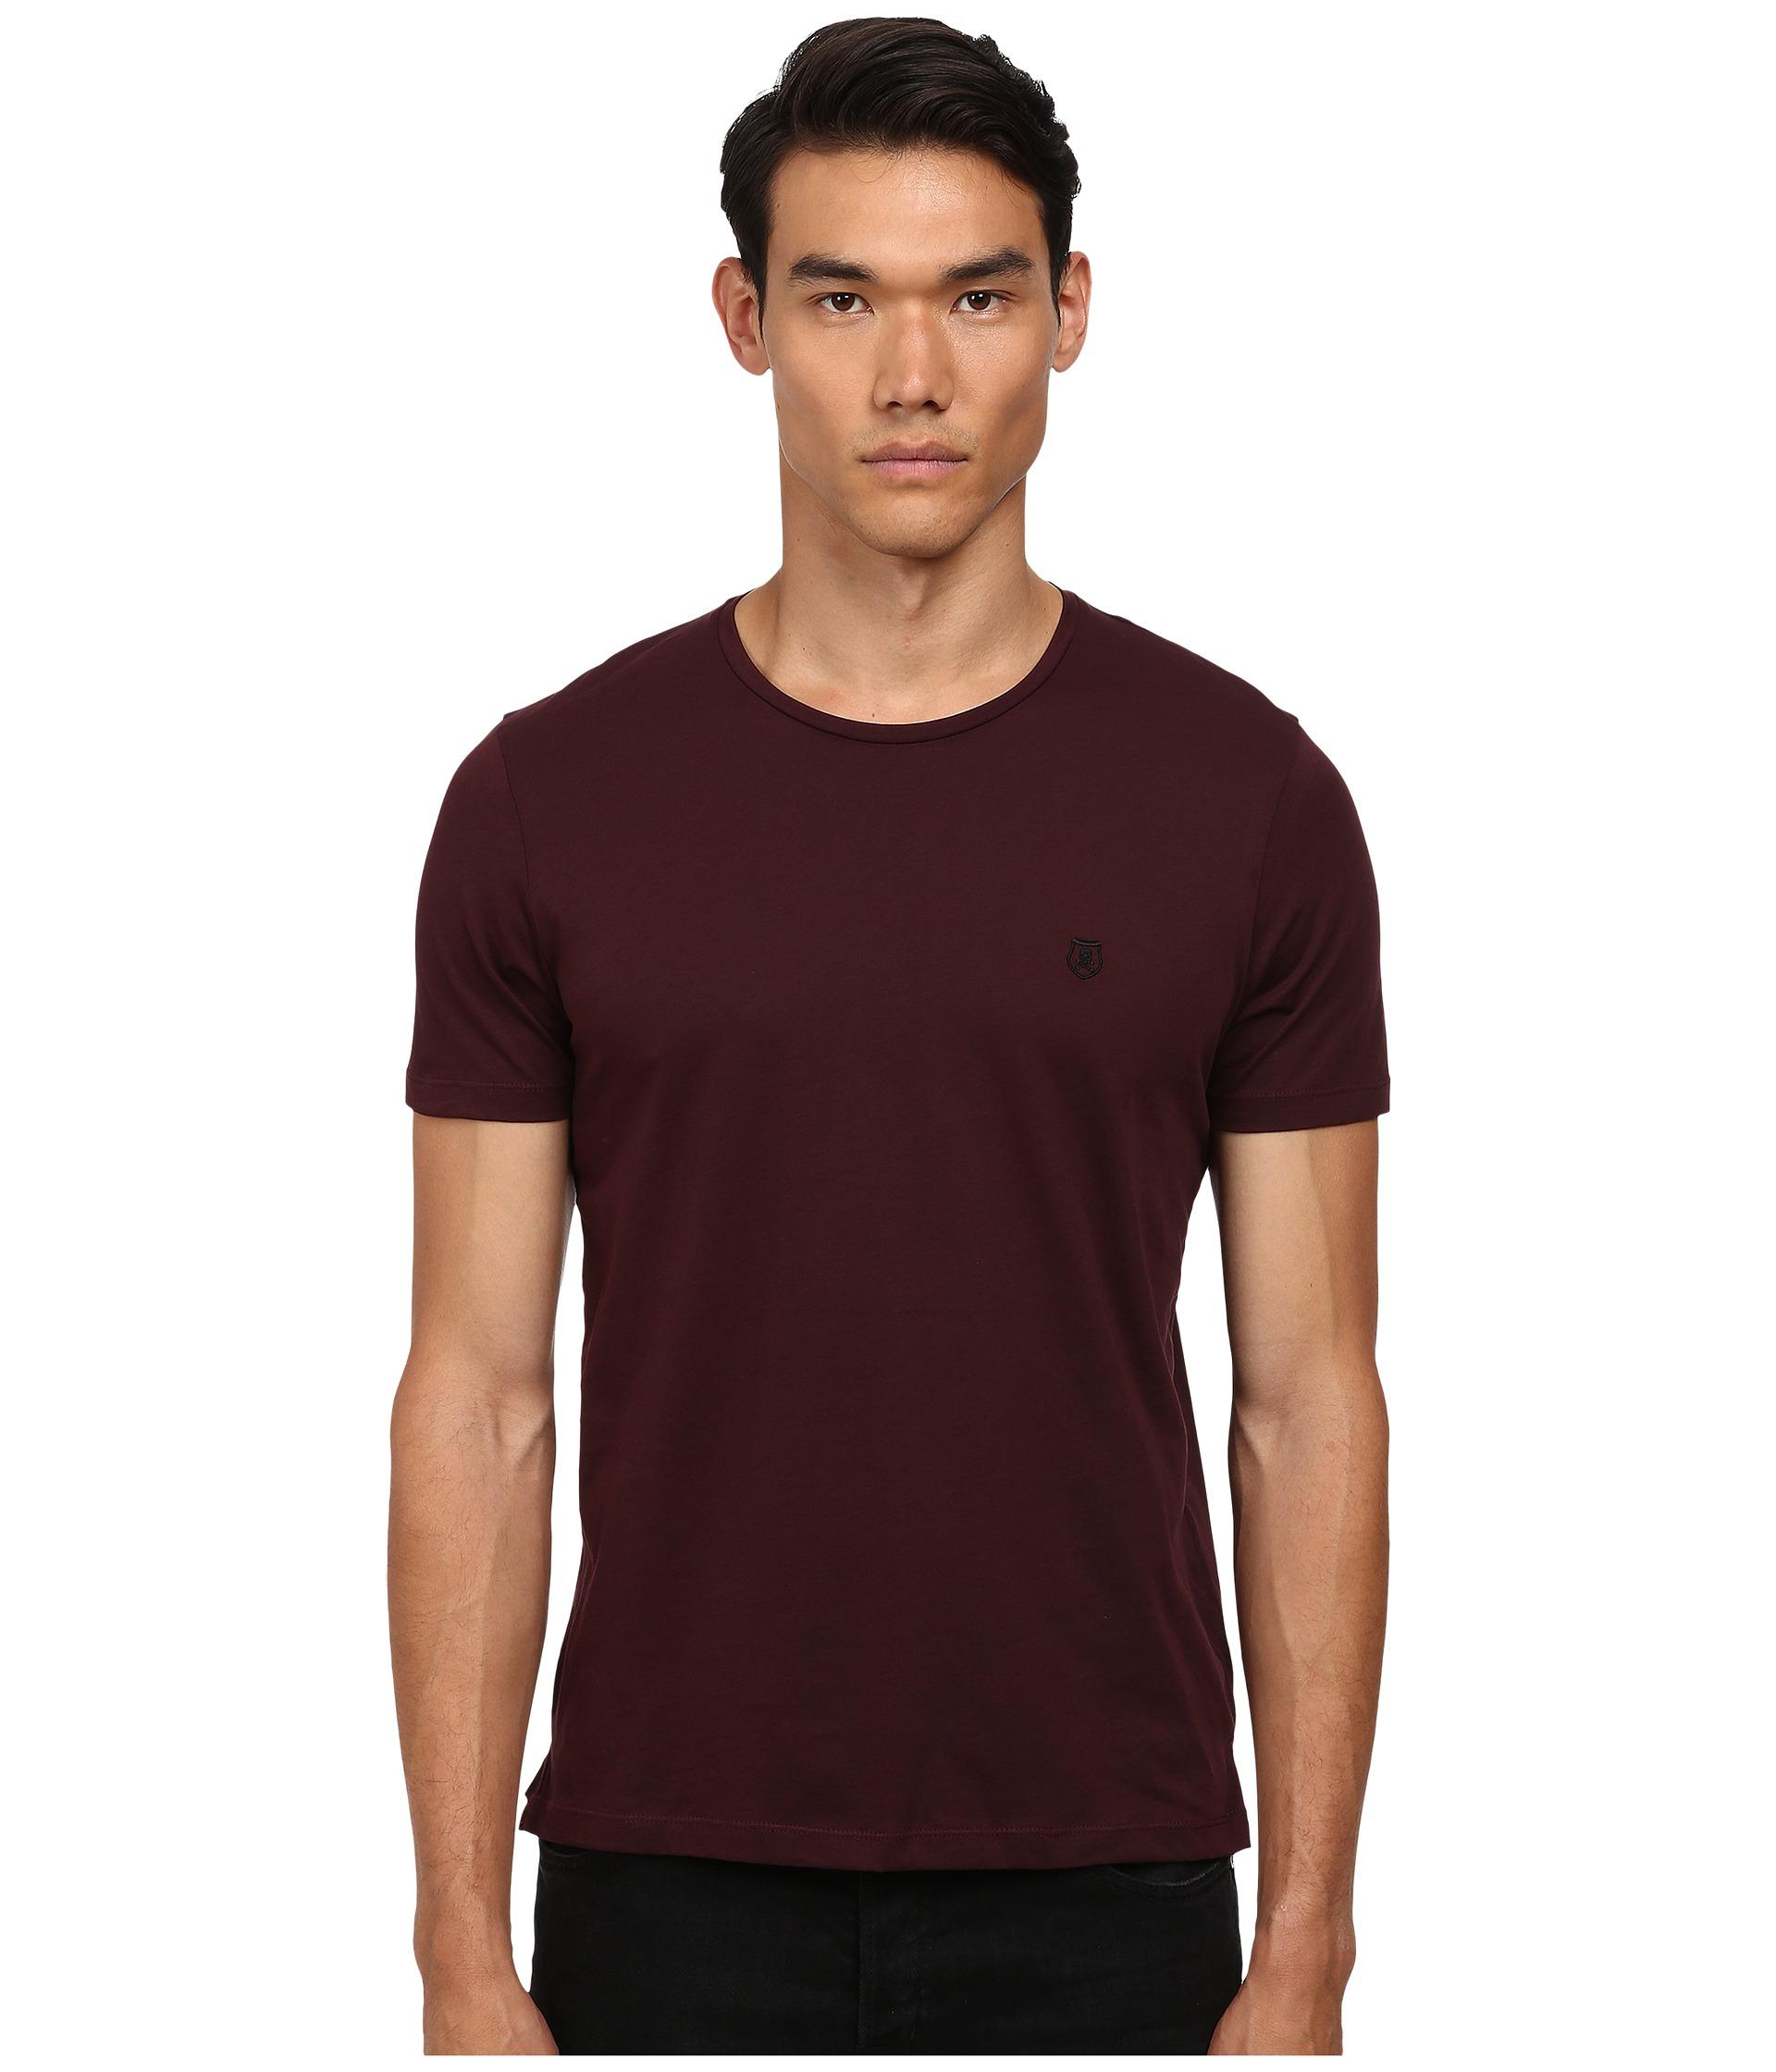 The kooples sport pima cotton crew neck t shirt in purple for Pima cotton crew neck t shirt